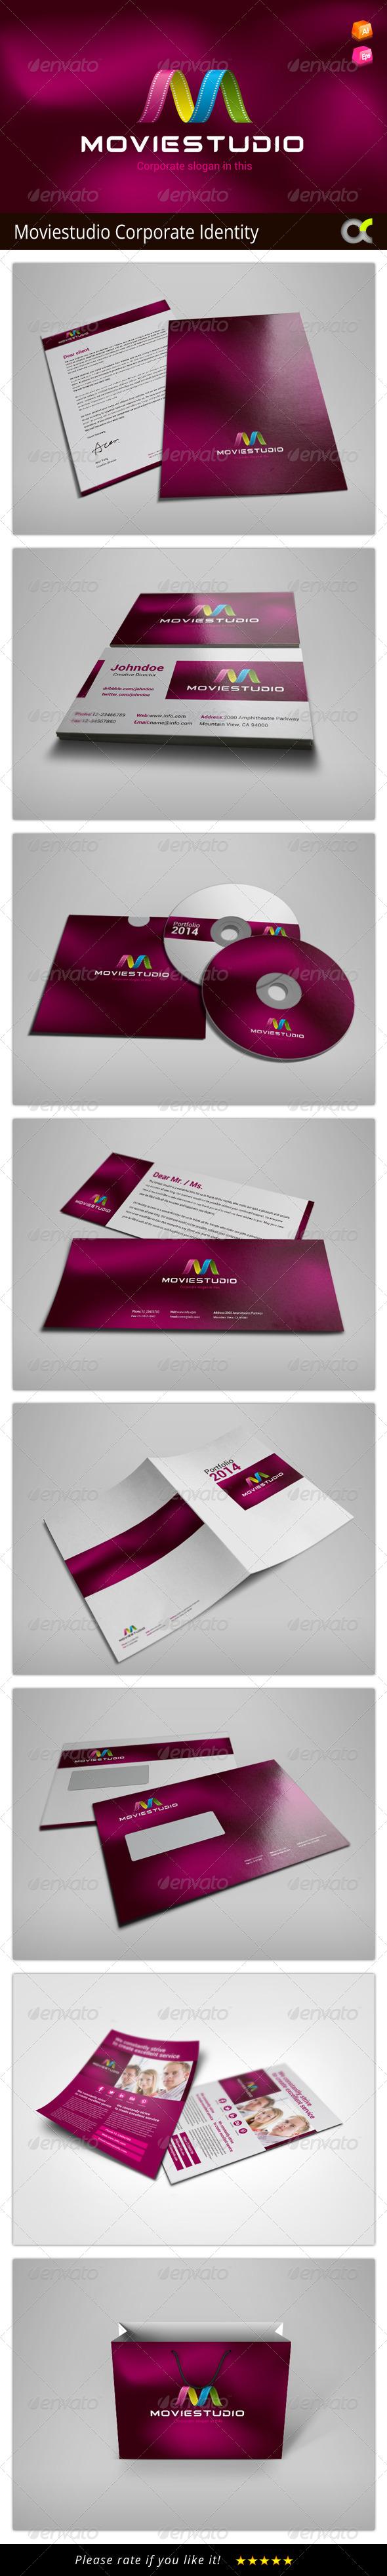 GraphicRiver MovieStudio Corporate Identity 8144846